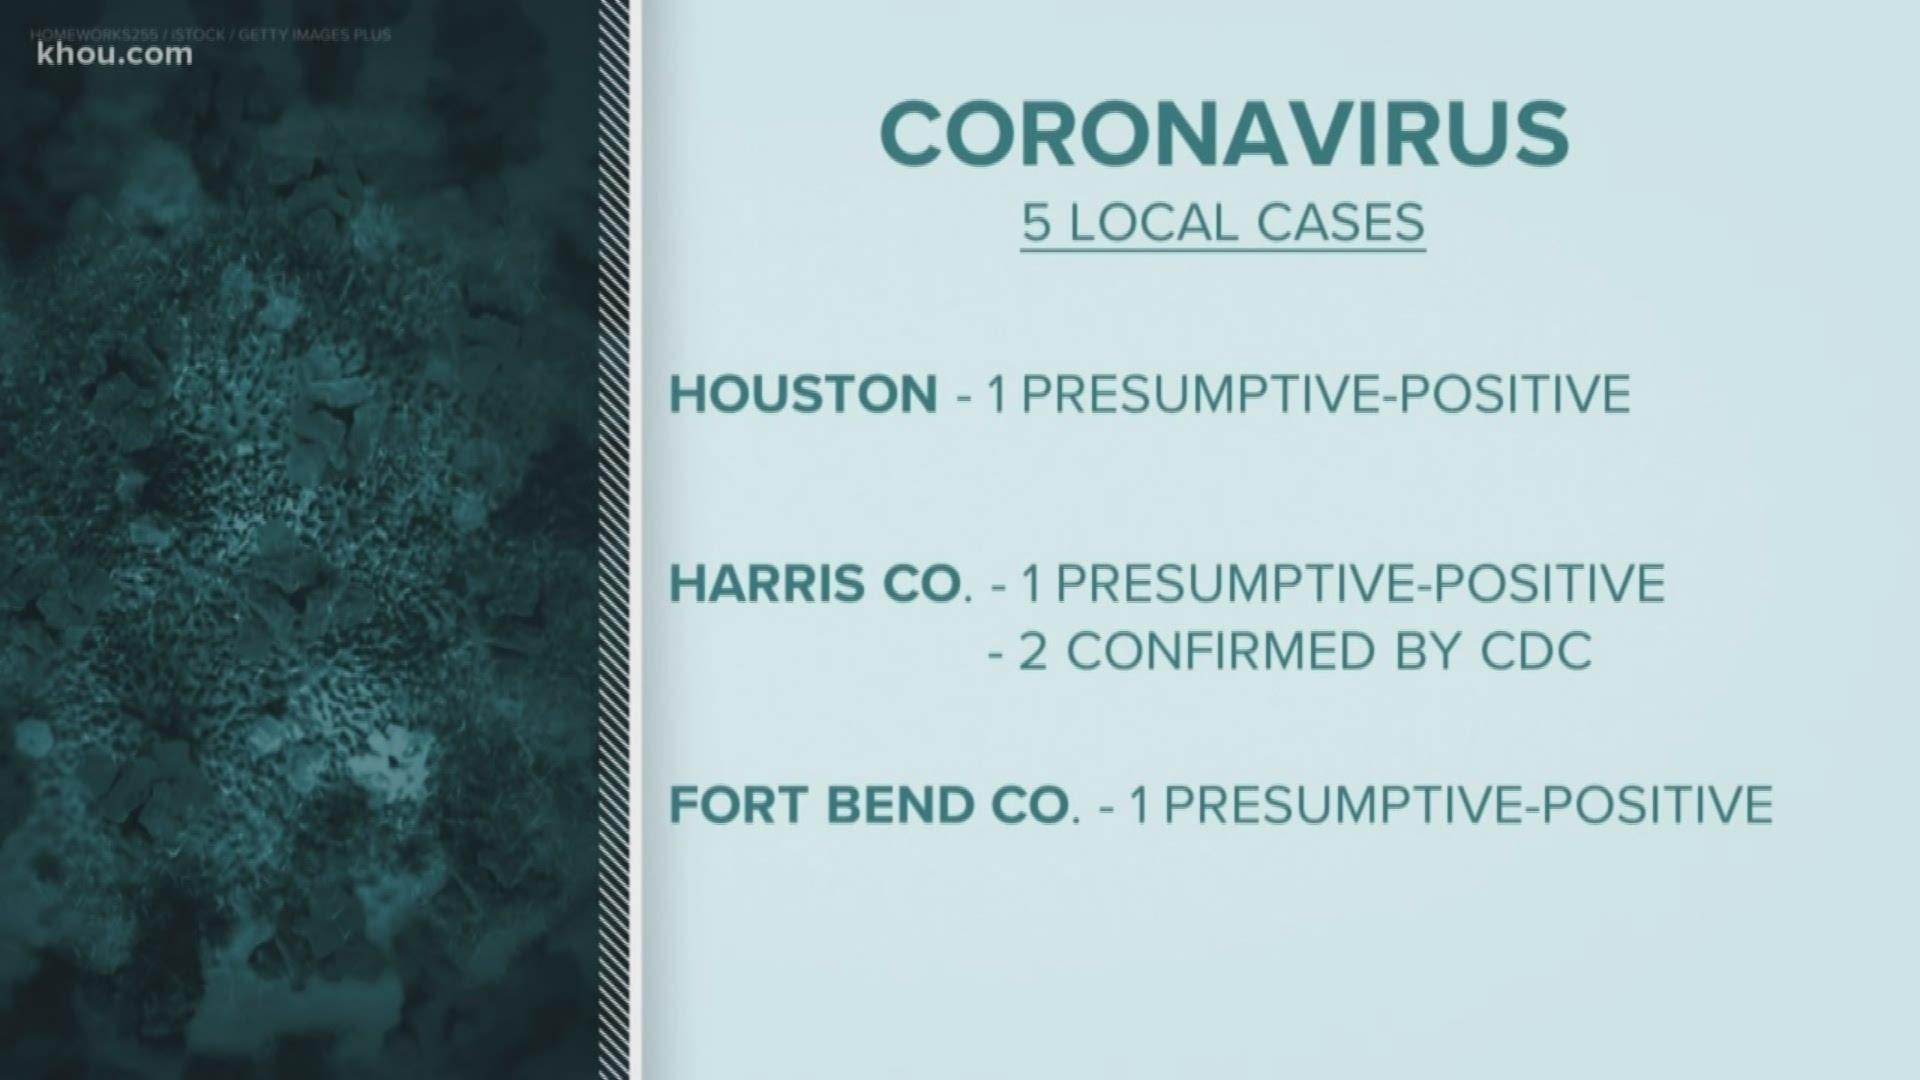 Coronavirus Patients In Houston Area Traveled Together To Egypt Khou Com